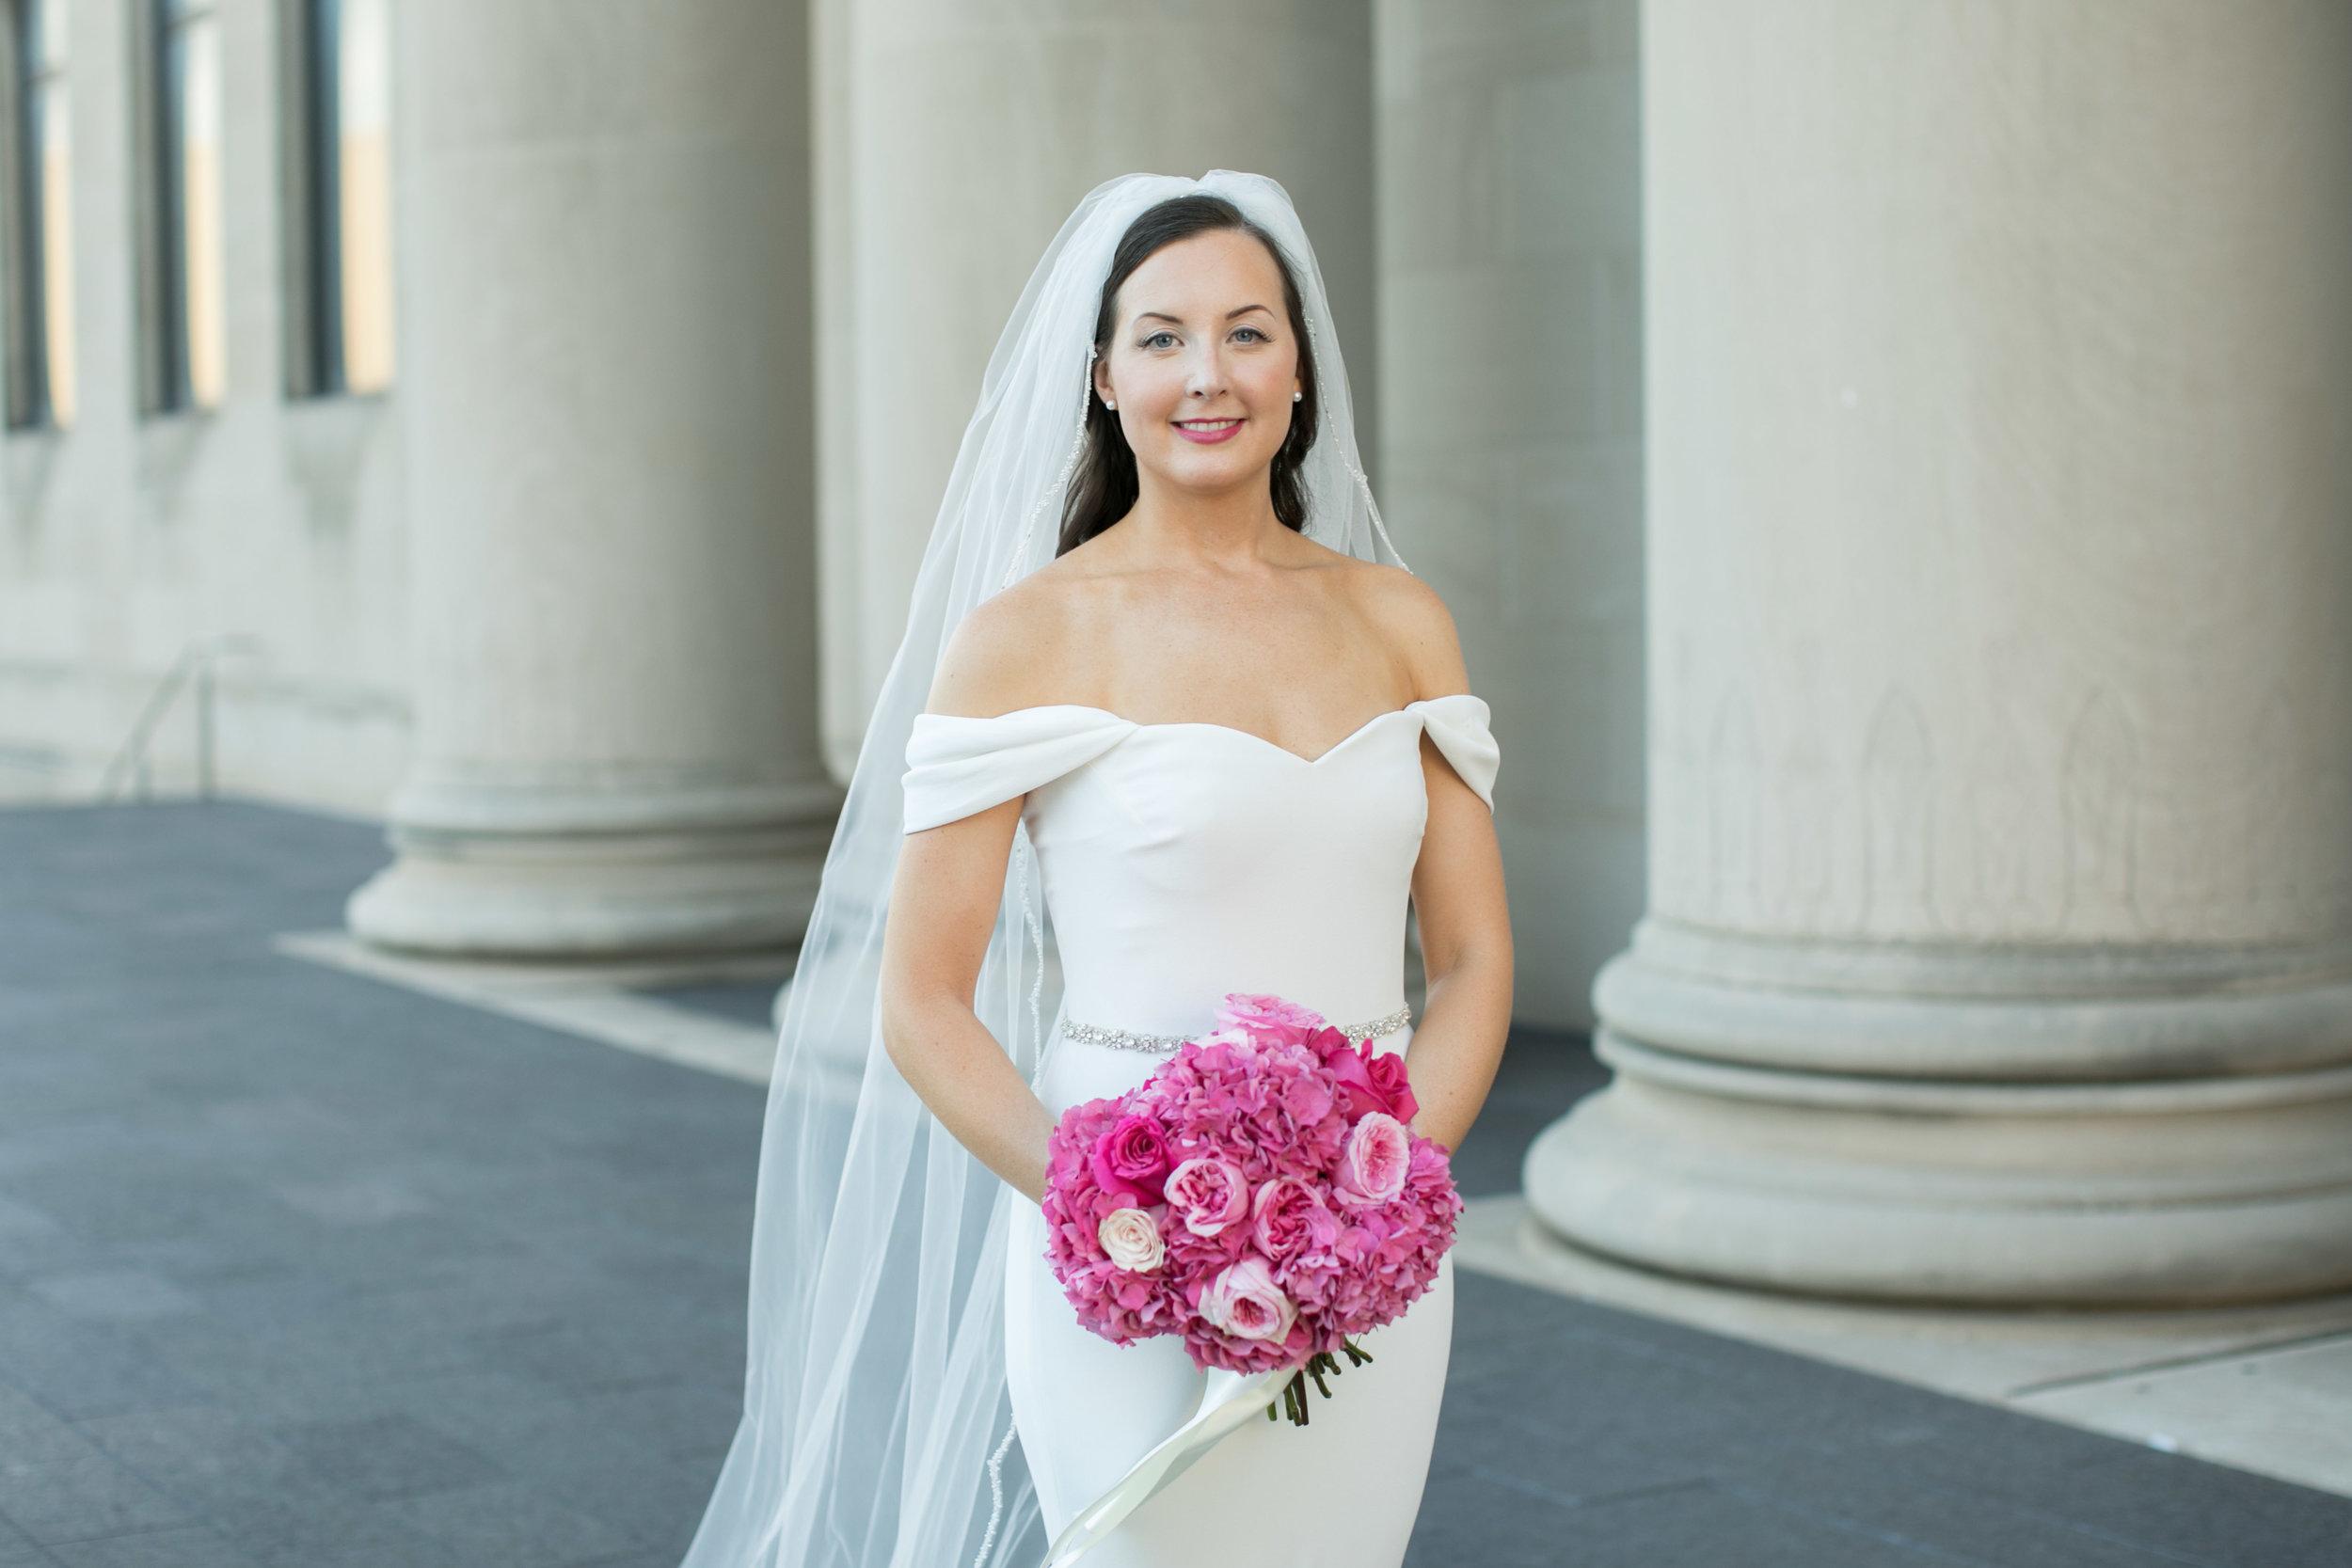 nelson-atkins-wedding-58.jpg